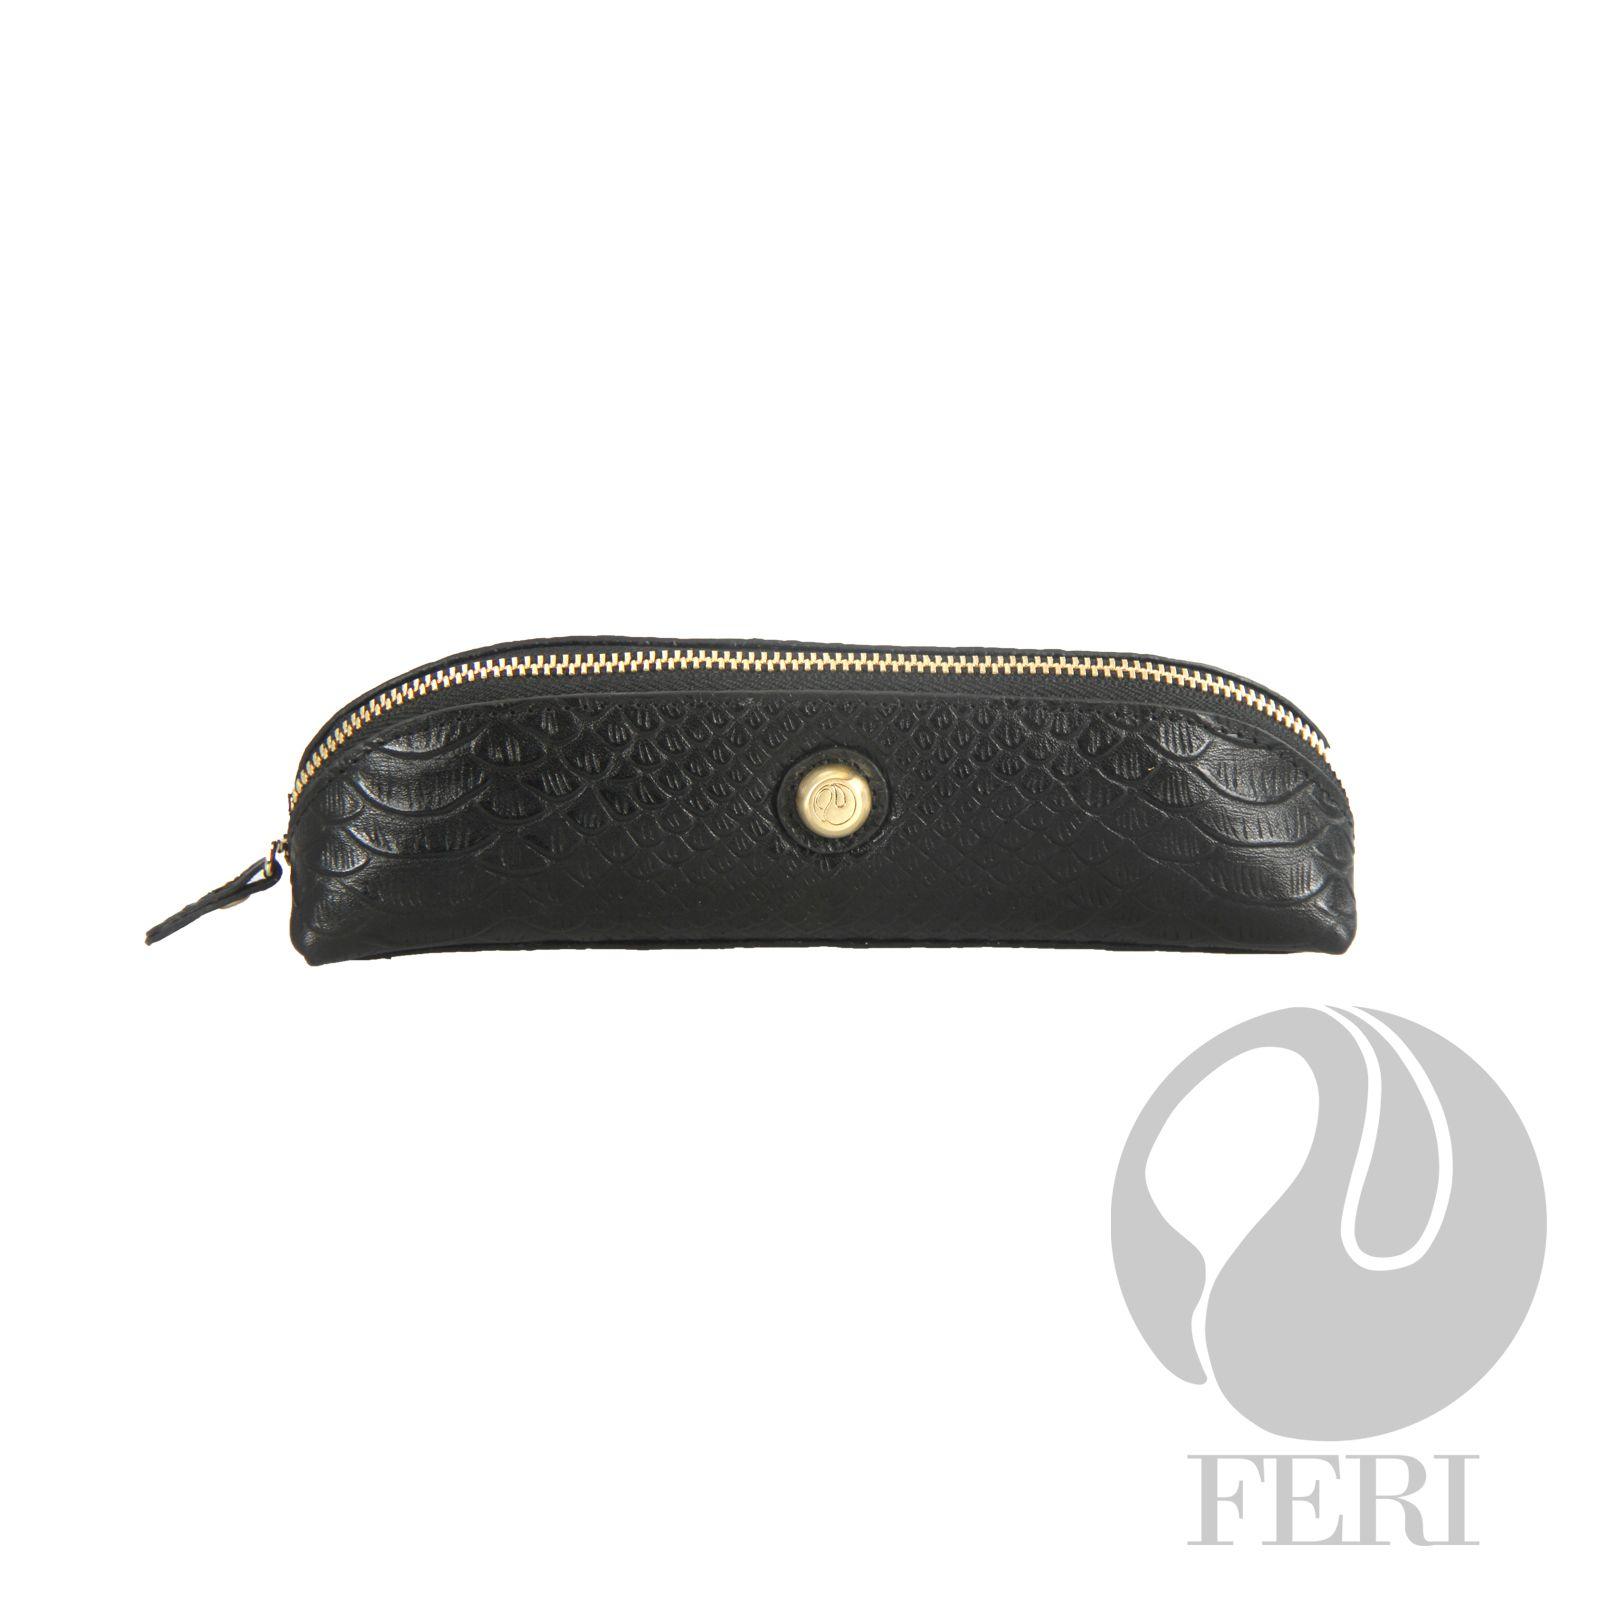 - High grade leather - Snake skin pattern - FERI custom lining - Zipper closure  - FERI Deva makes a great accessory bag